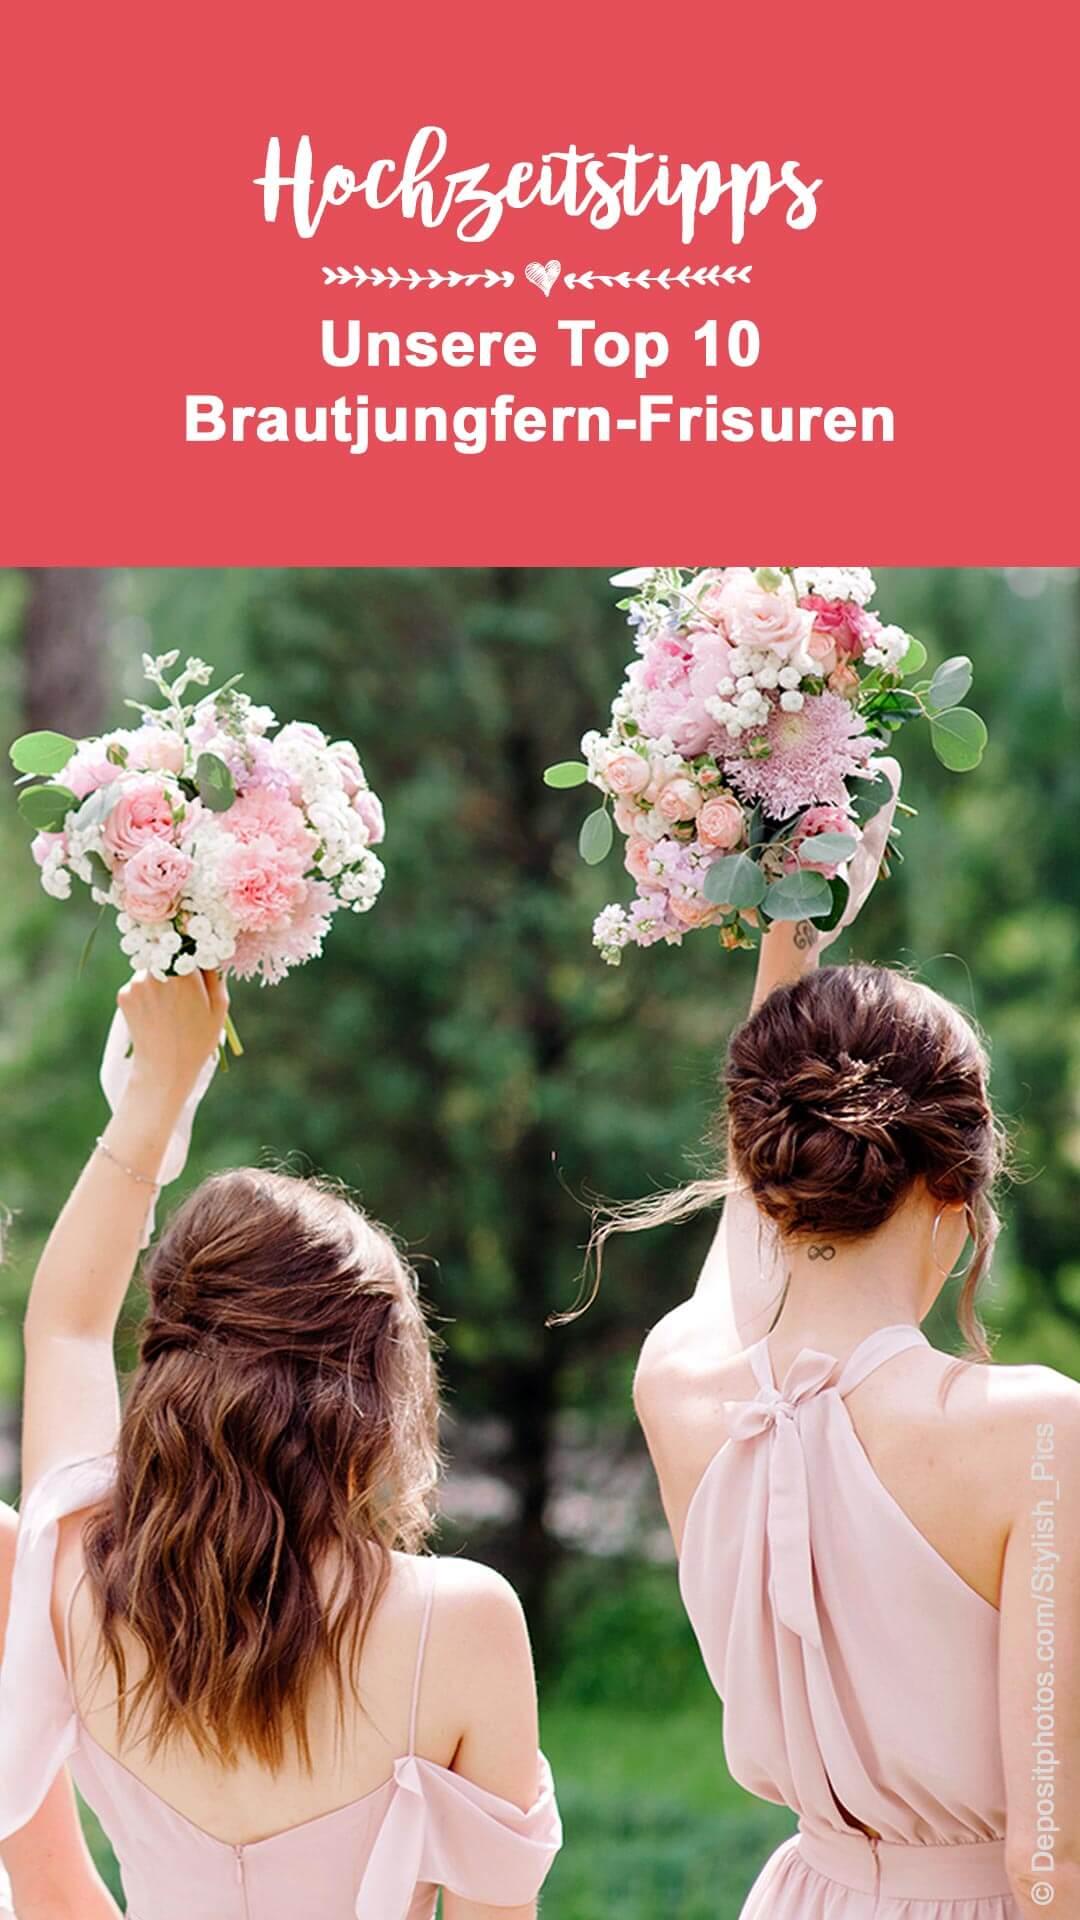 Brautjungfer Frisur - The 10 most beautiful bridesmaids hairstyles